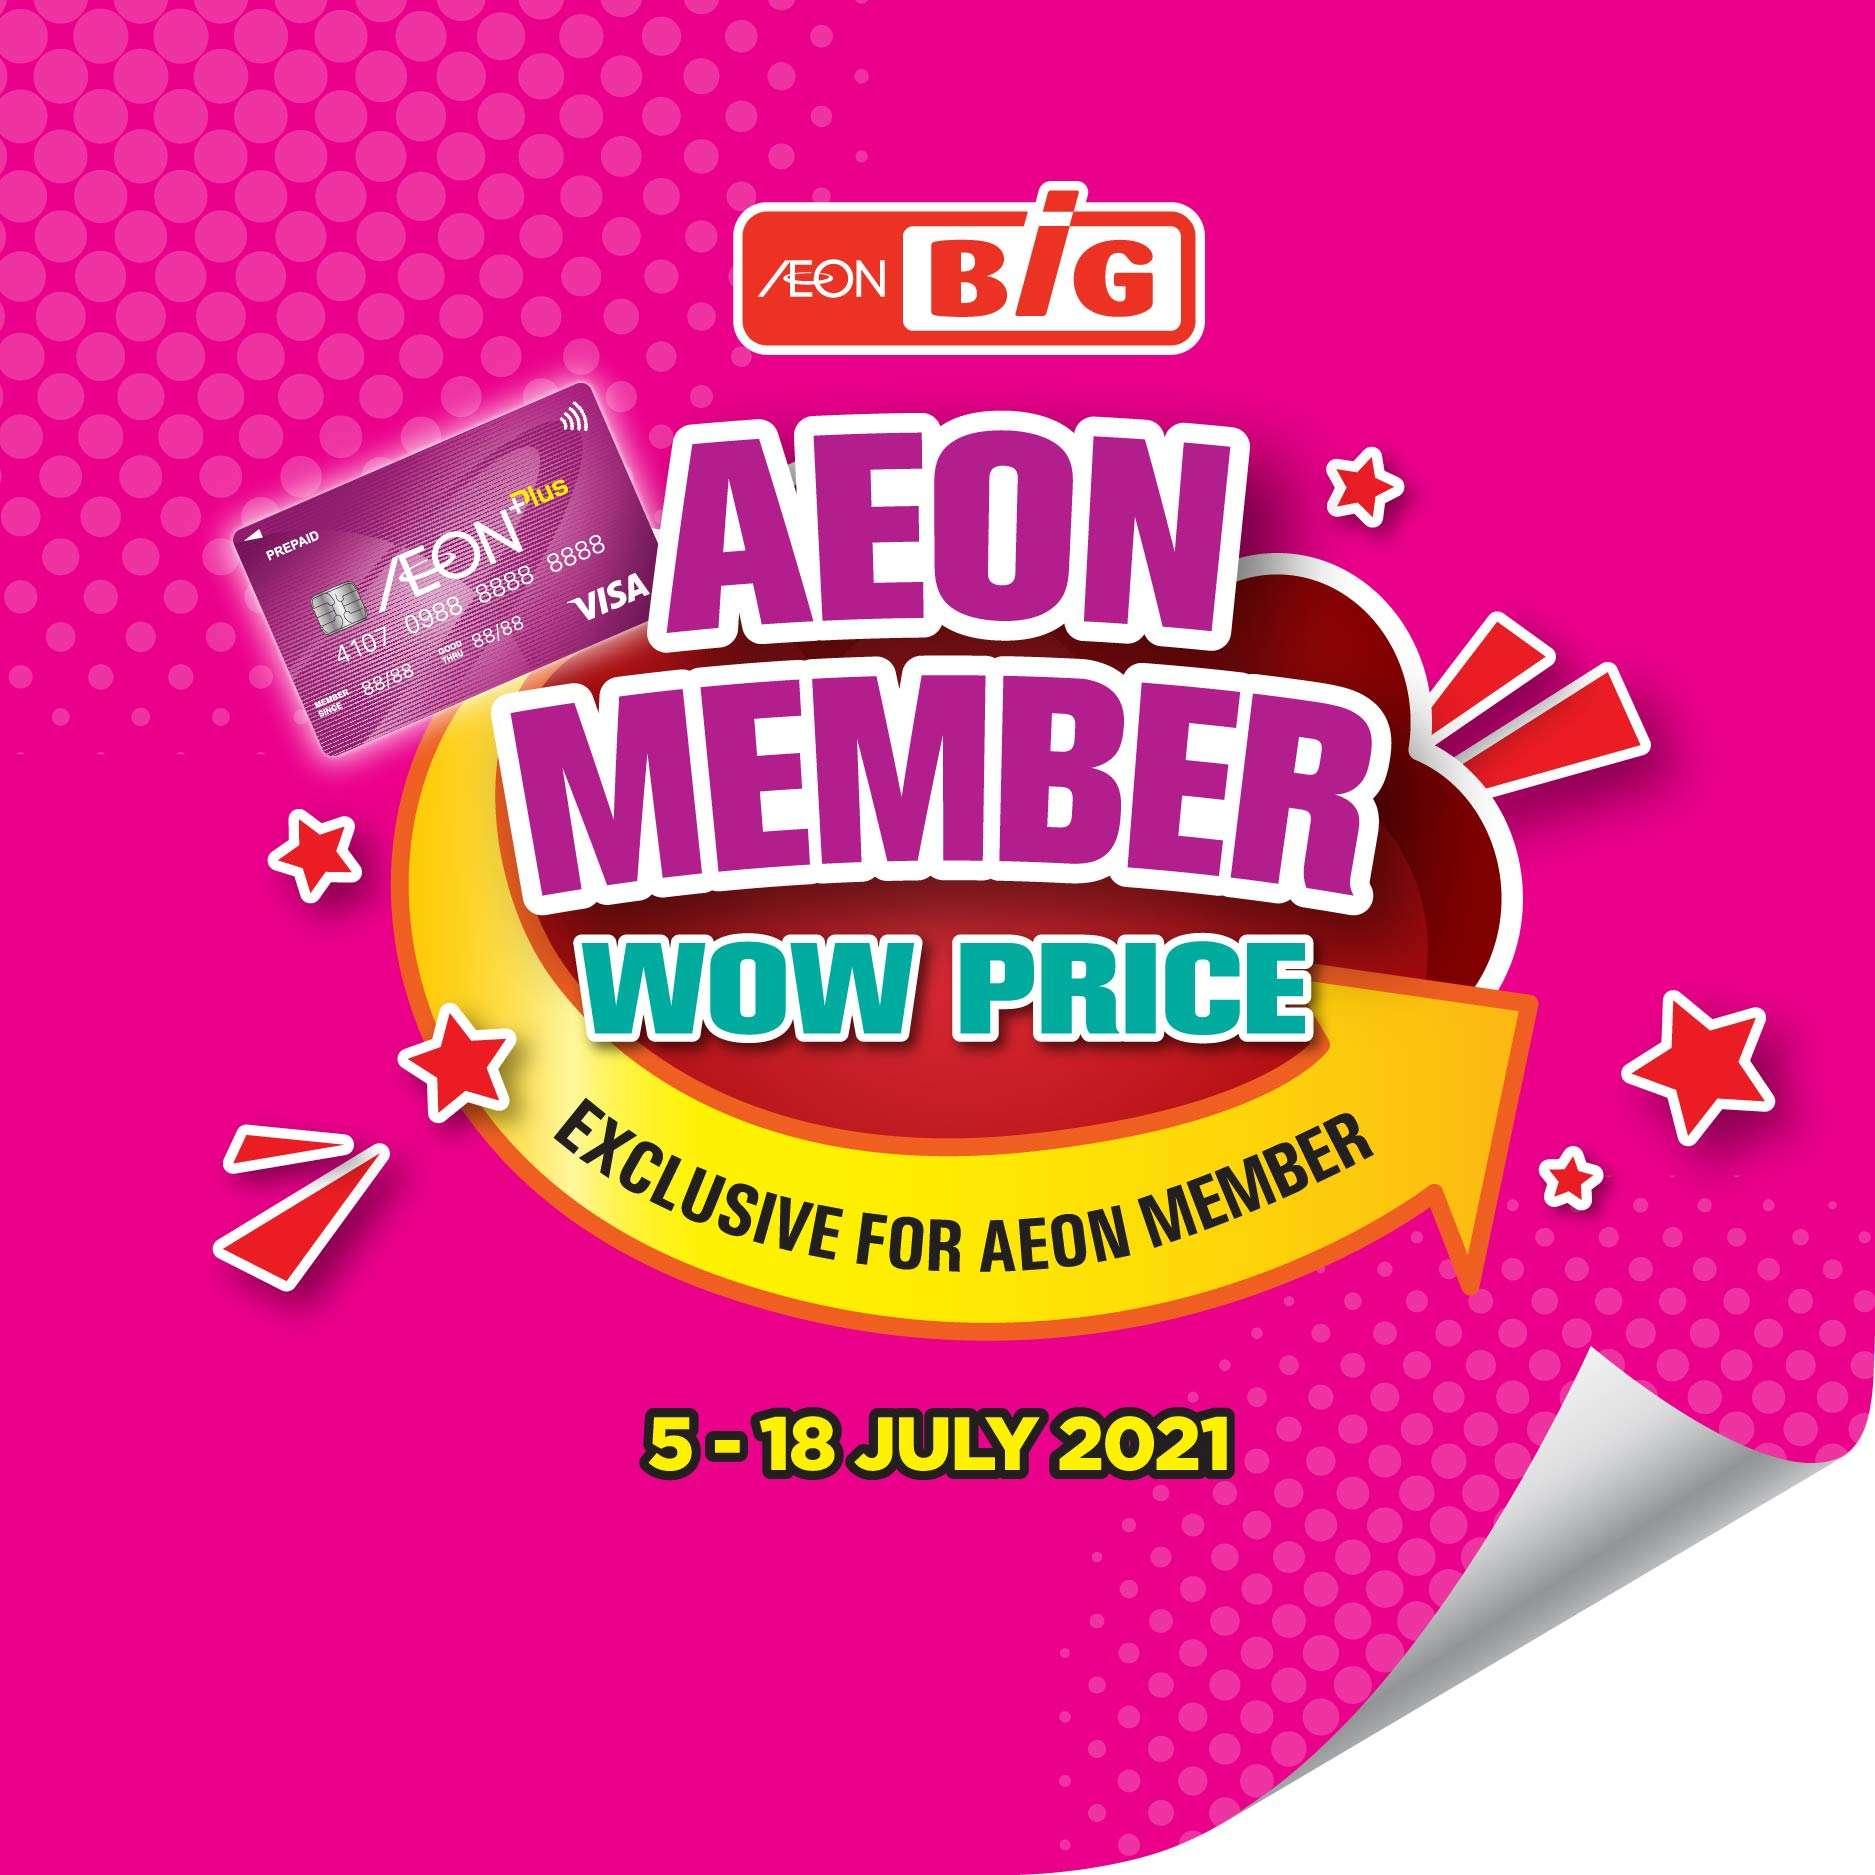 Aeon Big Catalogue(5 July 2021 - 18 July 2021)